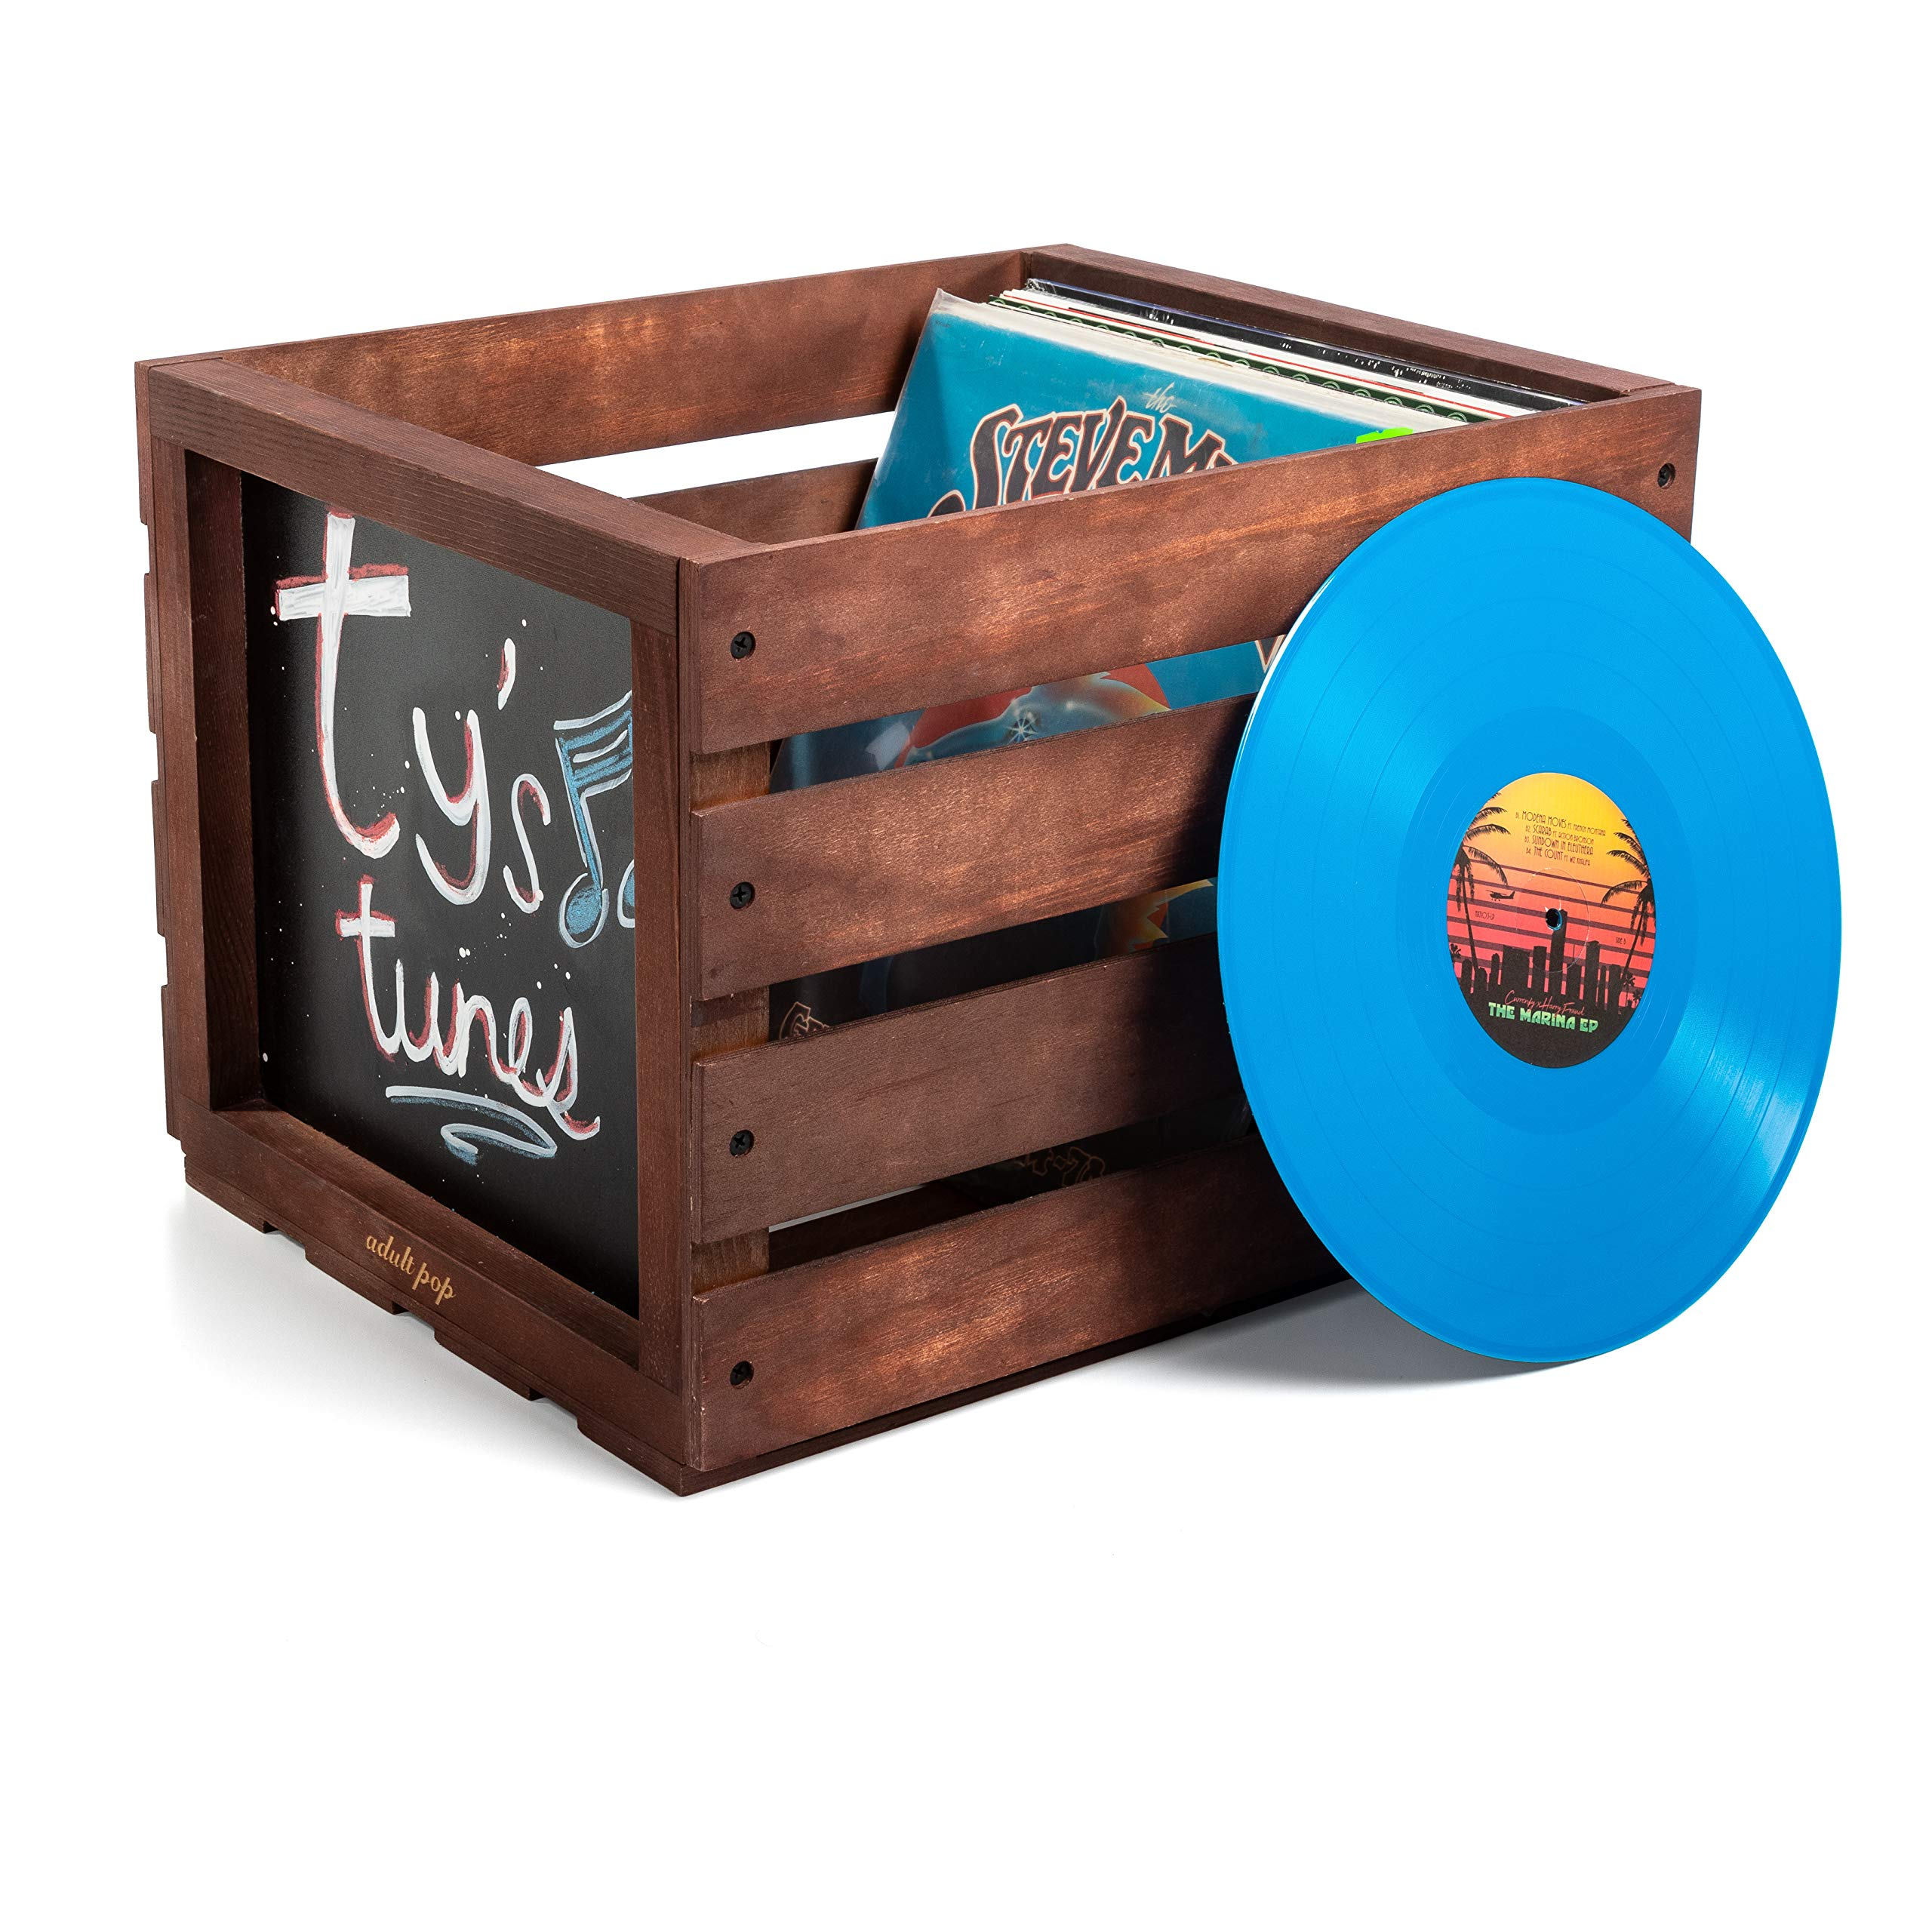 Chalkboard Vinyl Record Storage Crate (Espresso) by Adult Pop